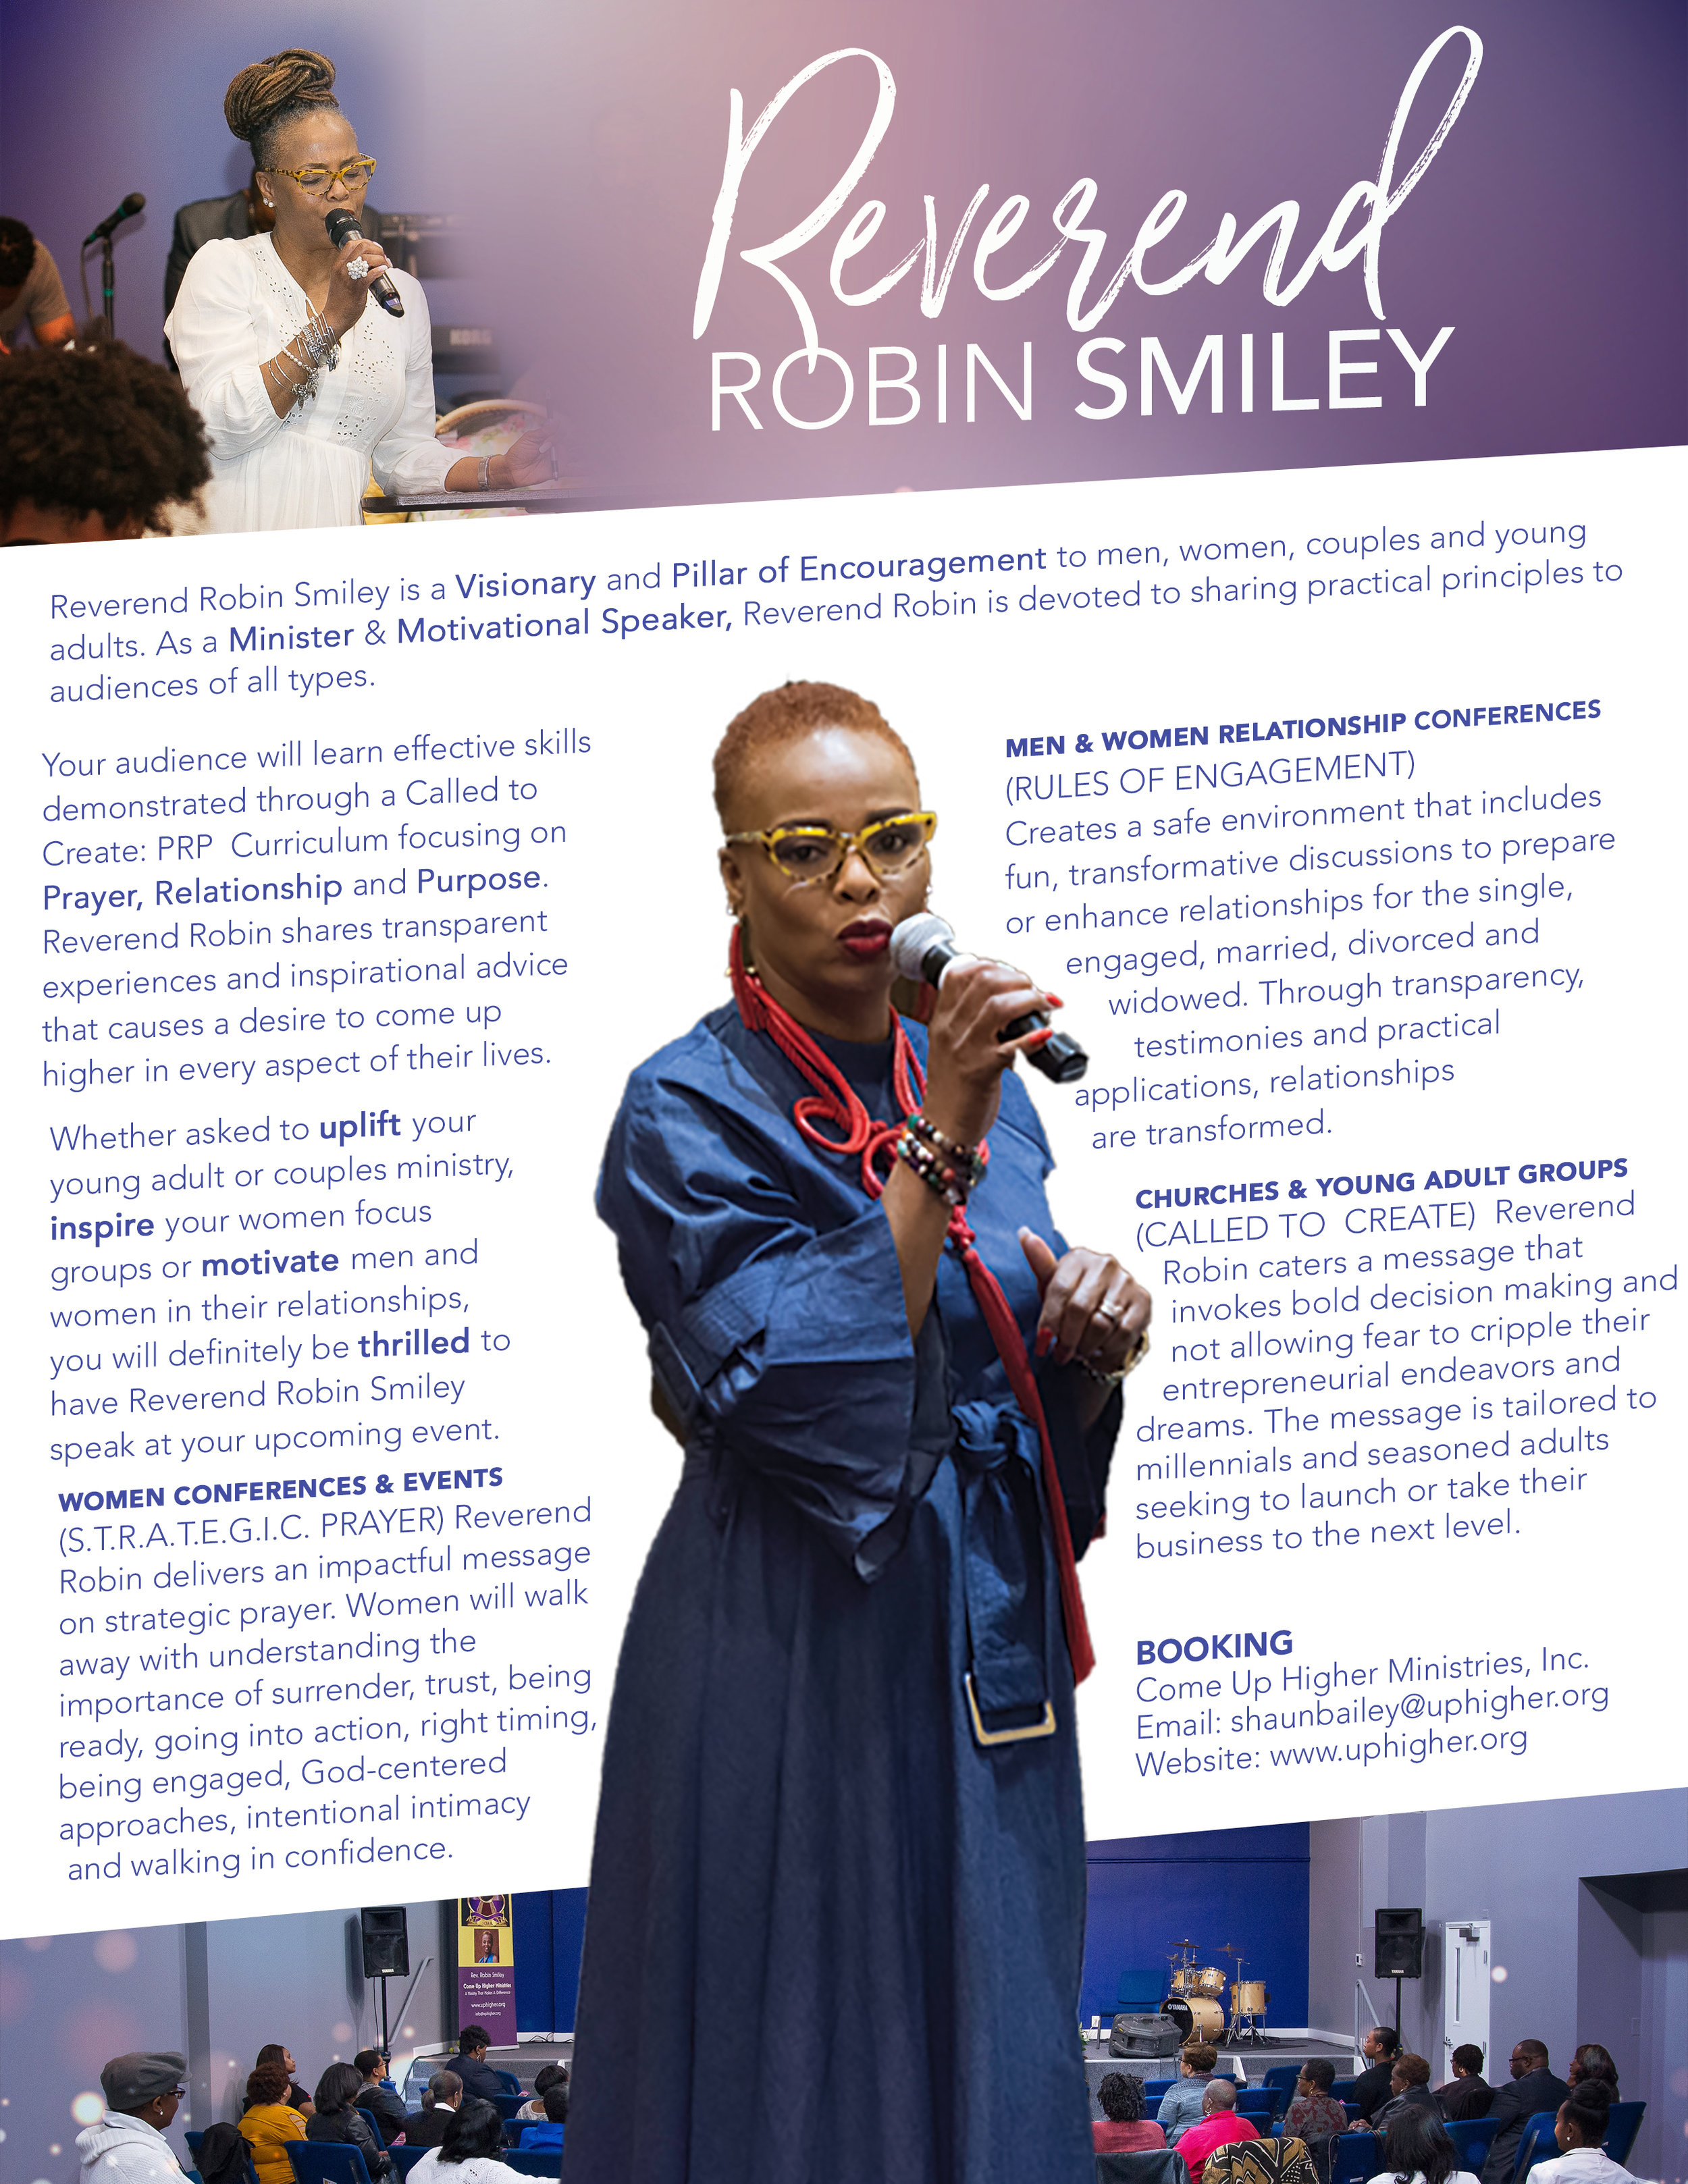 Rev.RobinS Marketing 1 Sheet.jpg